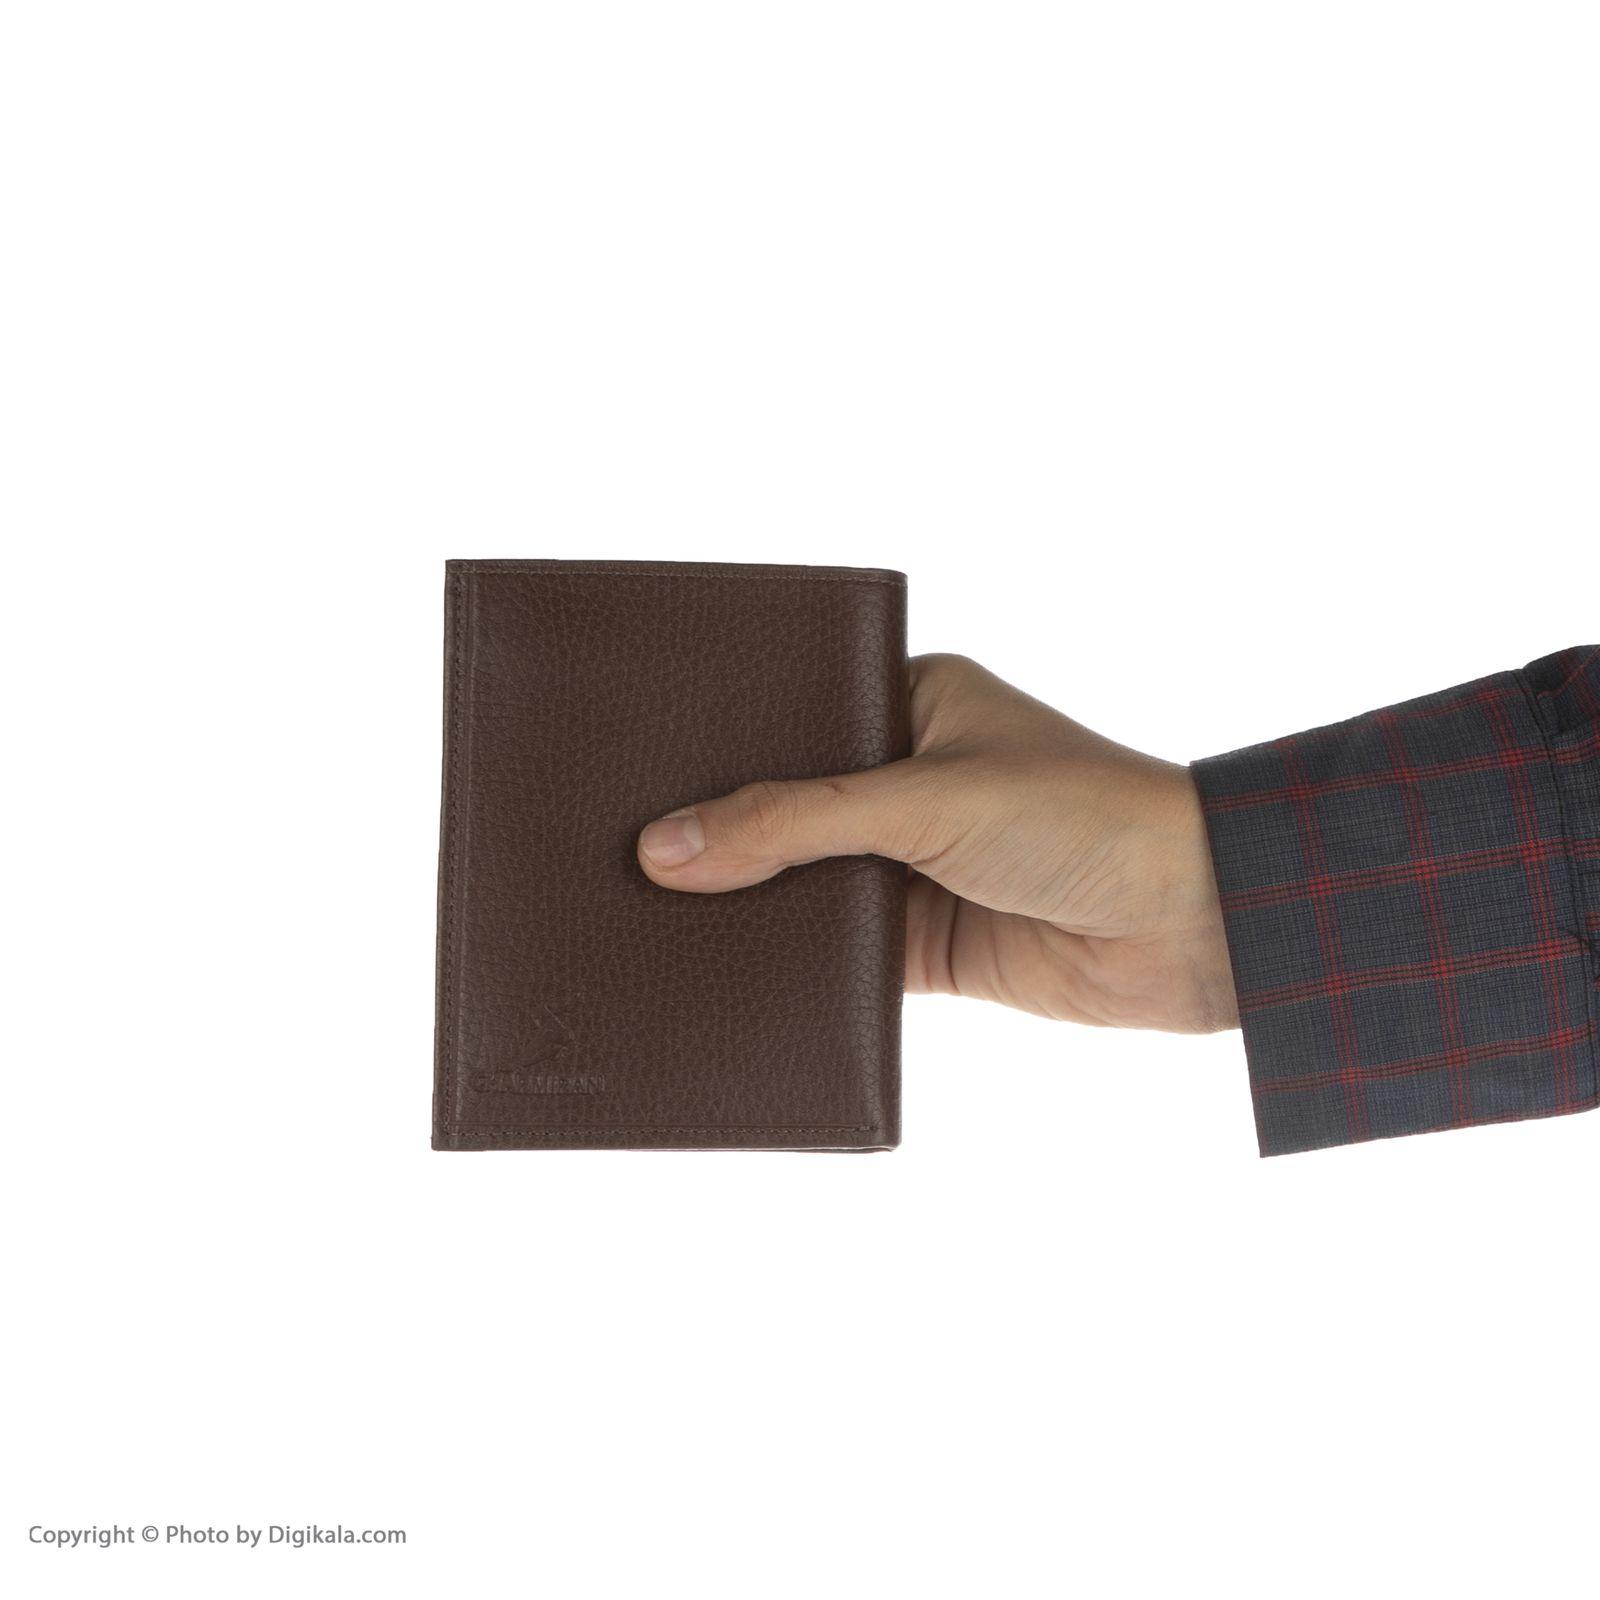 کیف پول مردانه چرمیران مدل 1000301 -  - 7